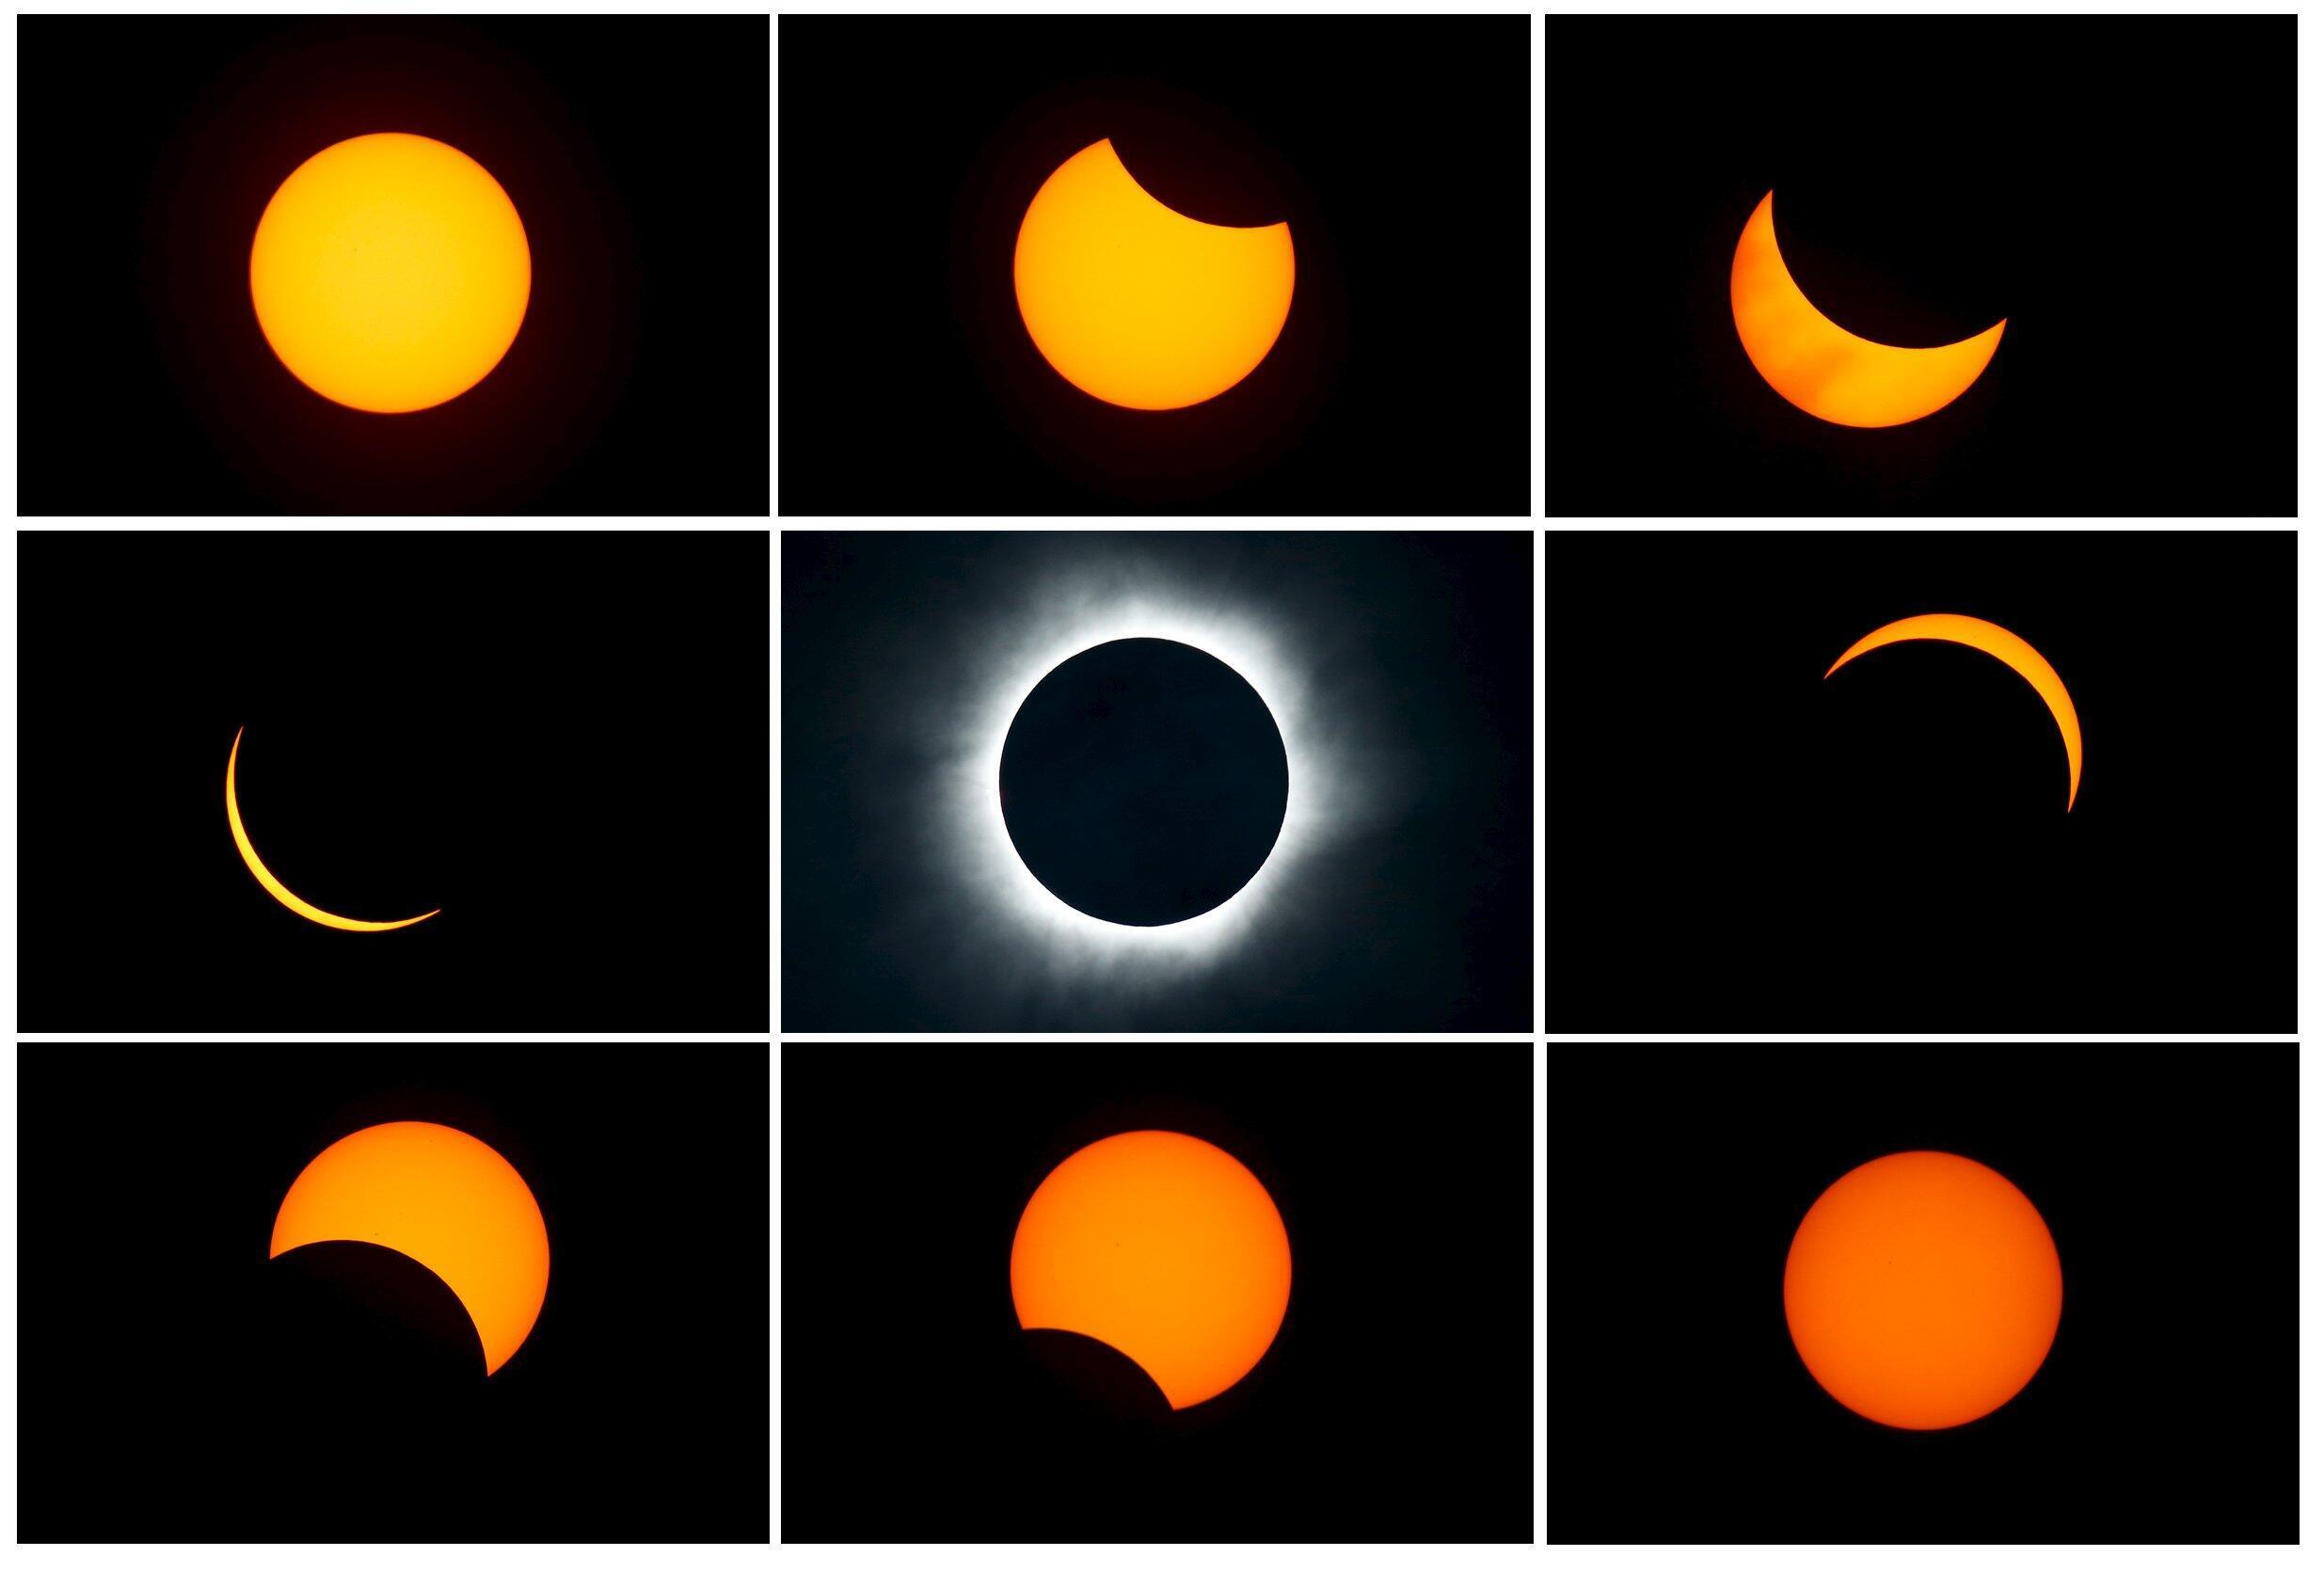 2019-12-04 astronomy sun moon total solar eclipse Ternate island Indonesia